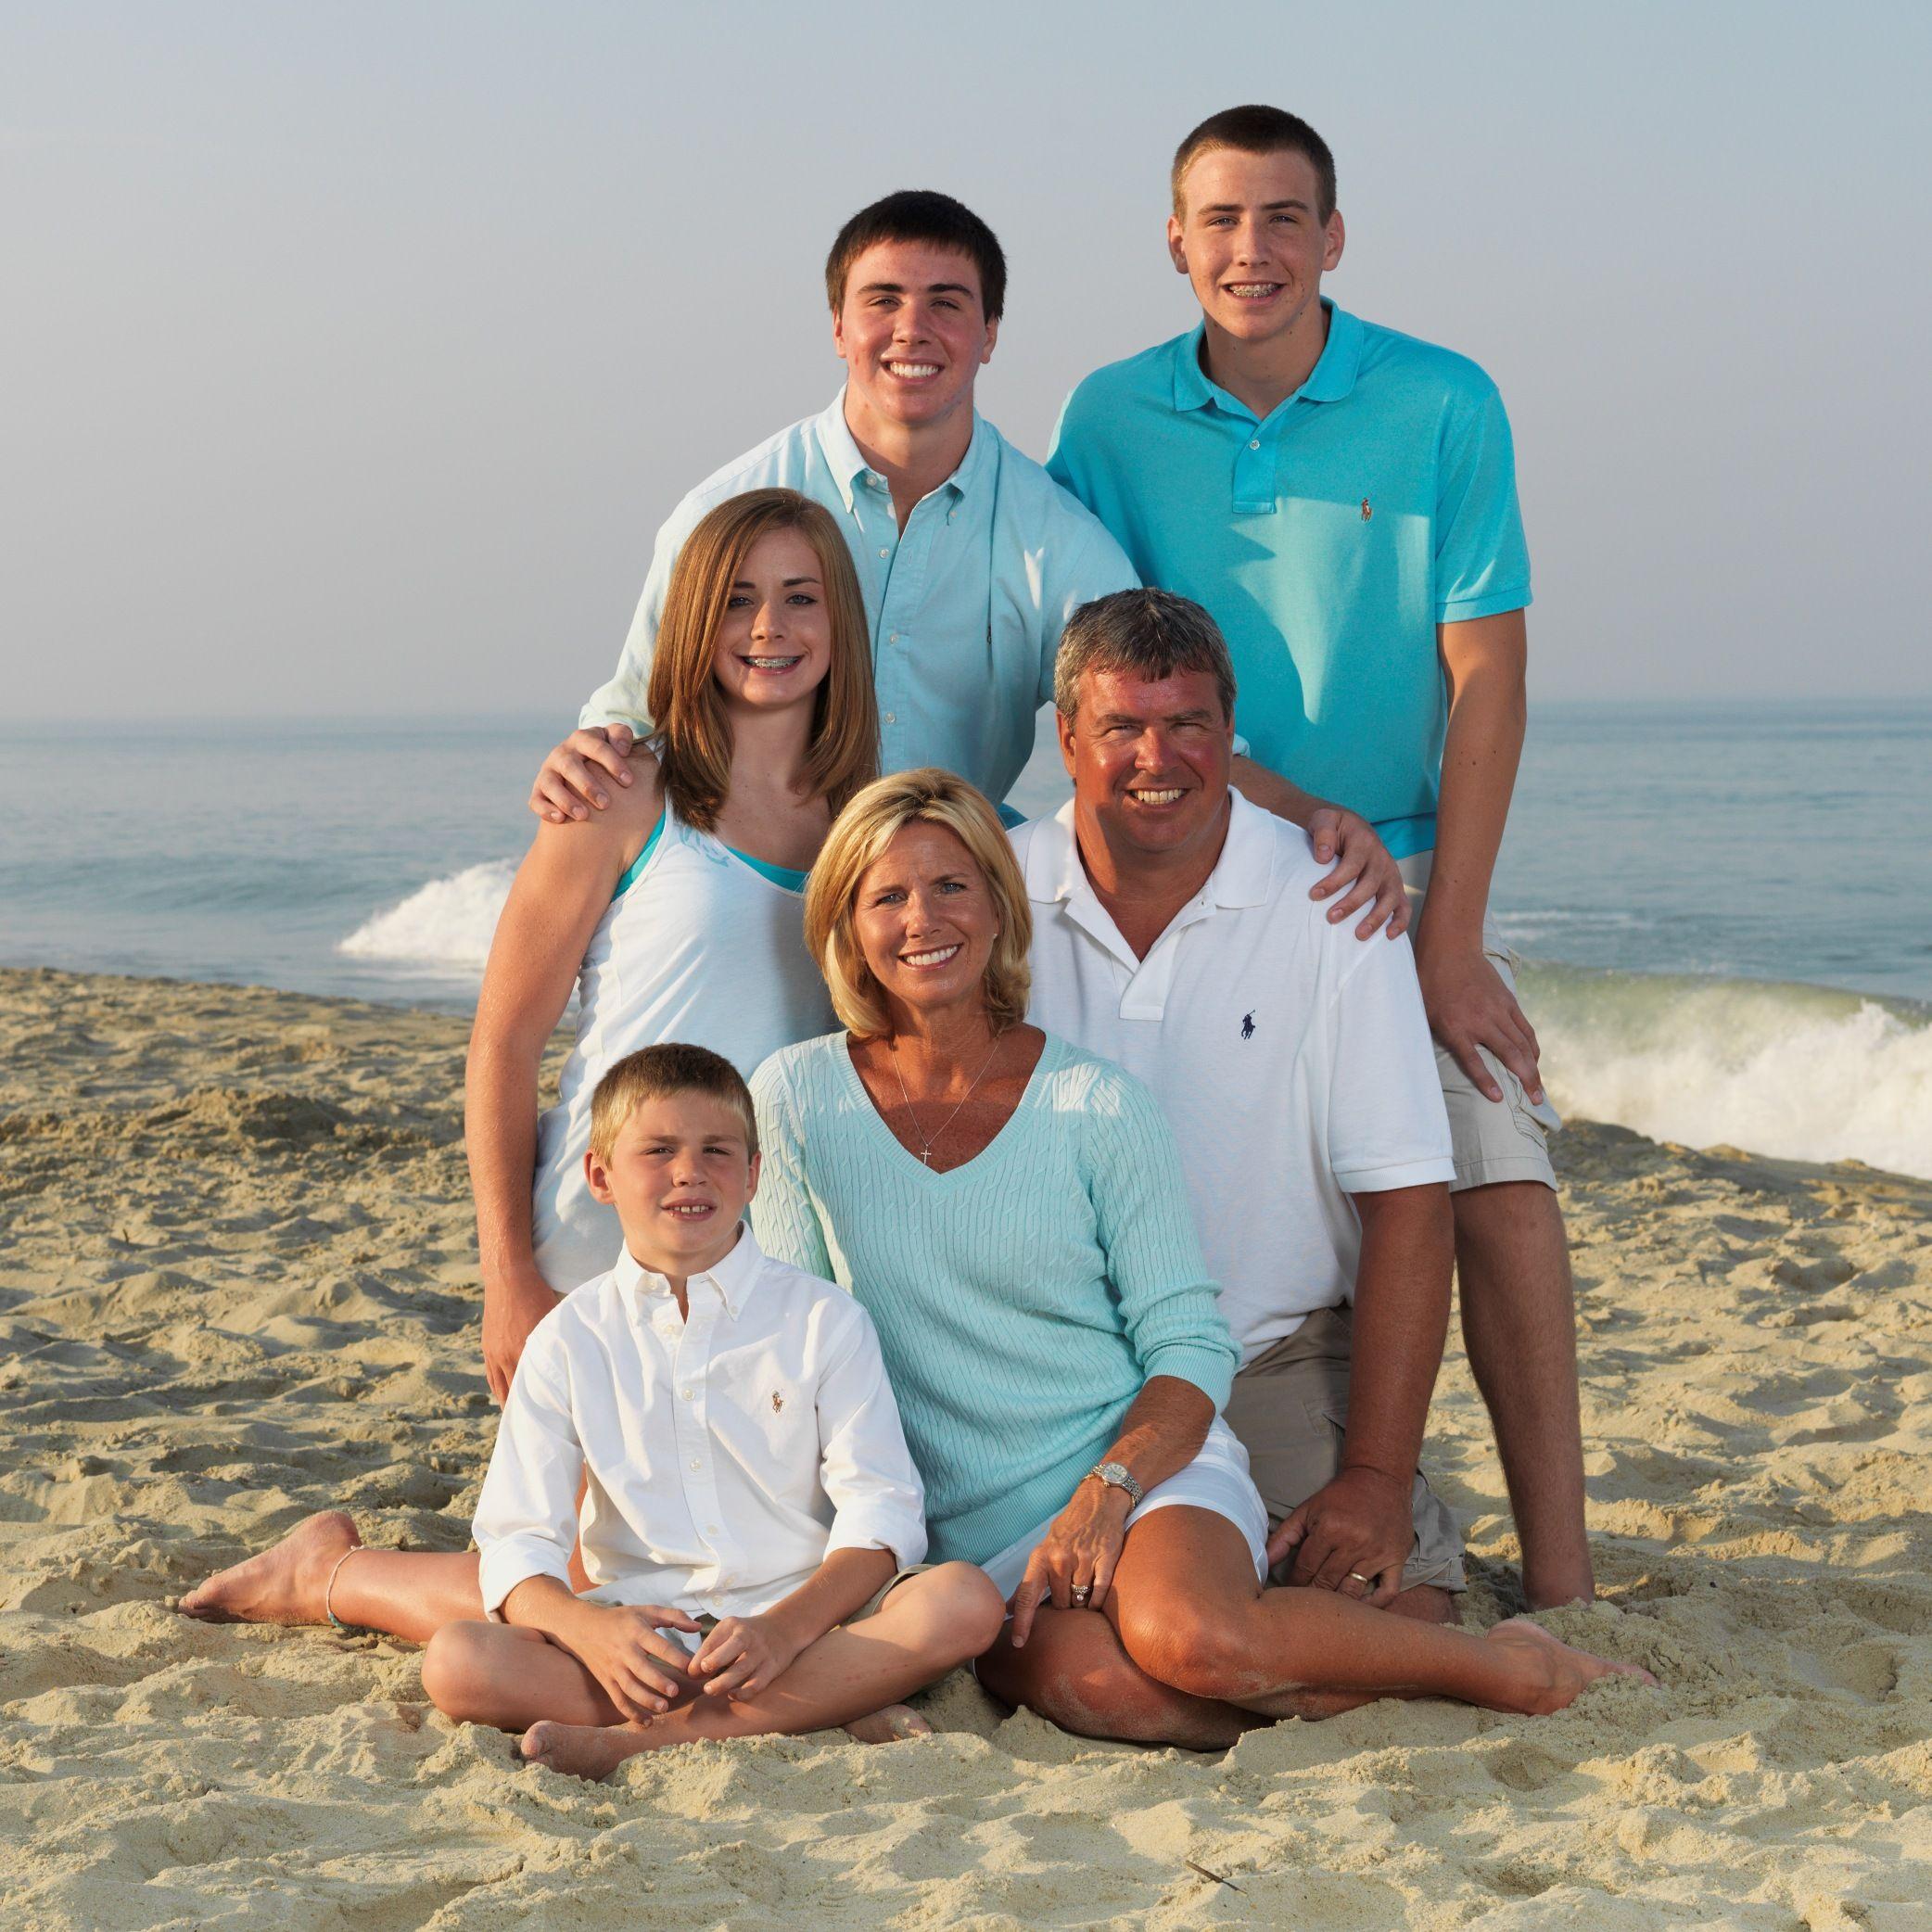 Beach Family Photos 1000 Images About Photos On Pinterest Beach Photos Family